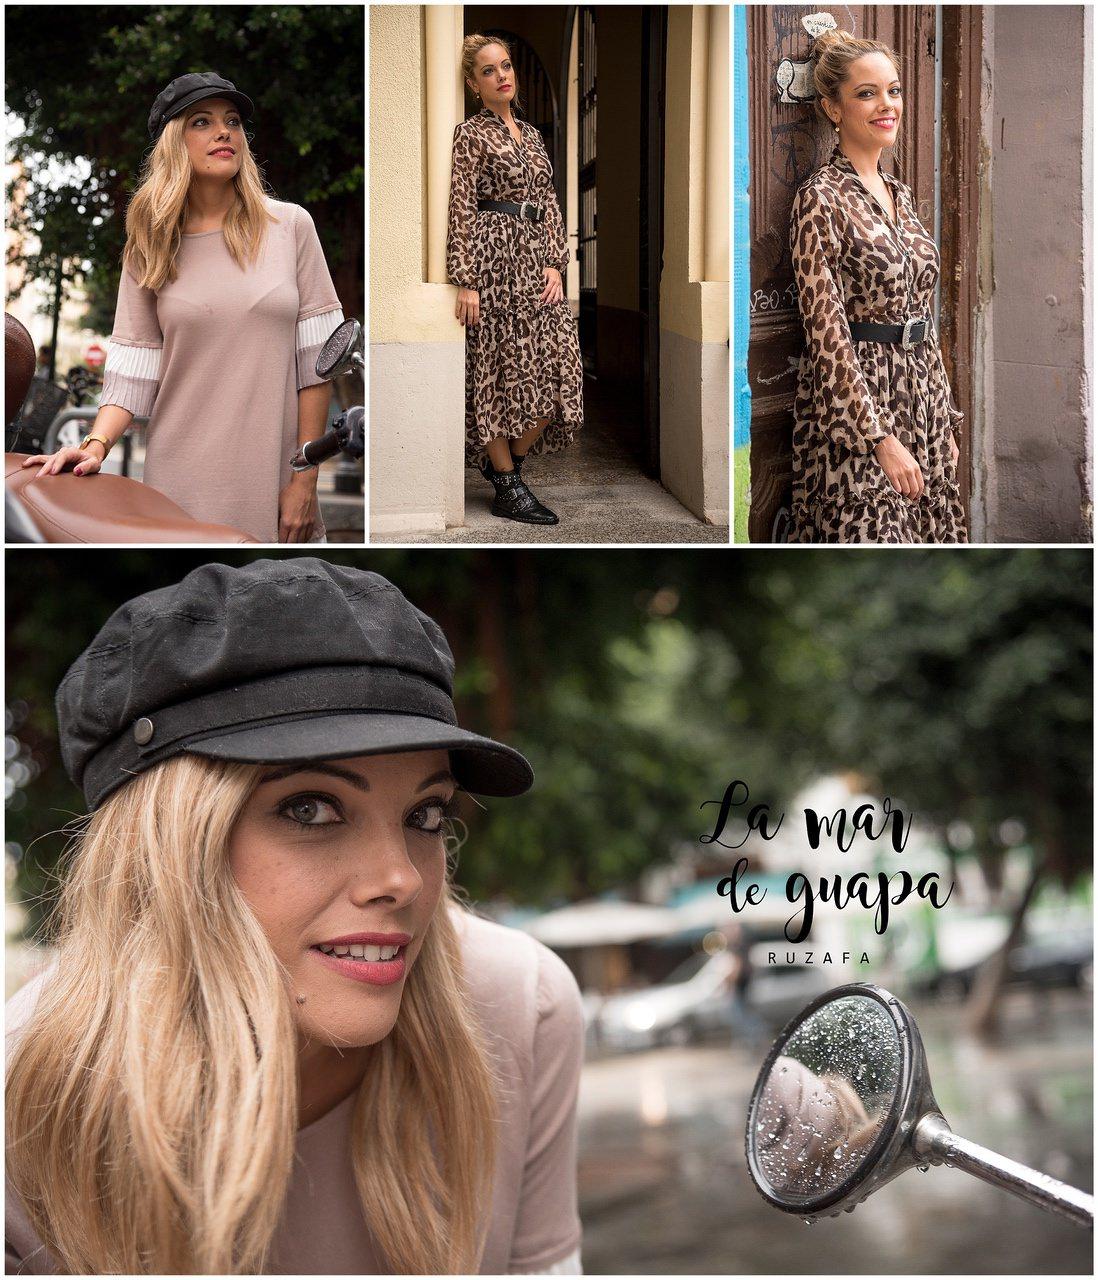 fotografo moda valencia-ruzafa4